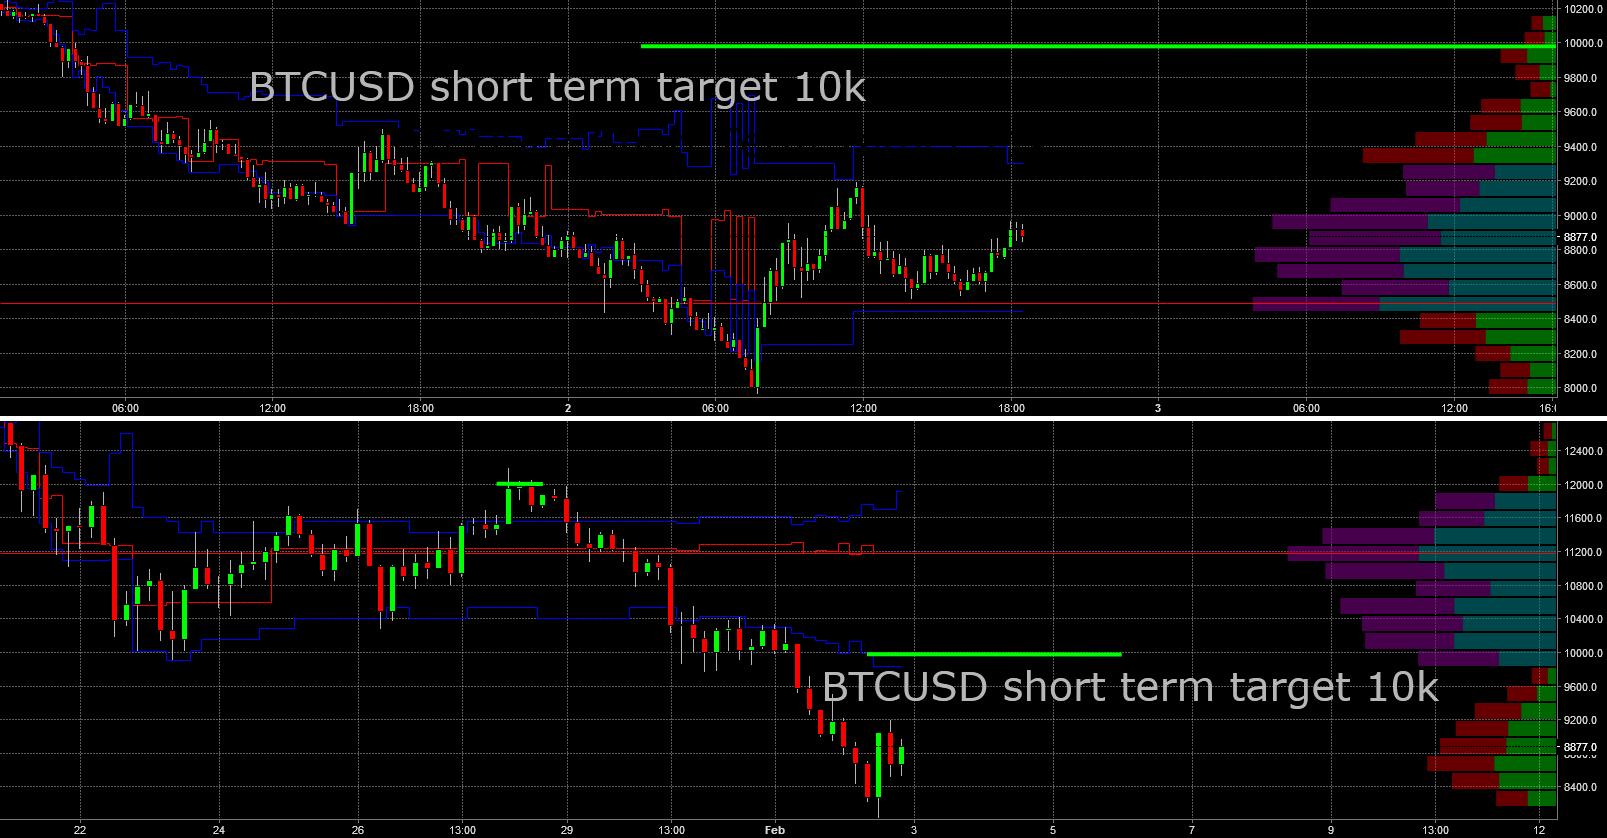 BTCUSD: Short Term Target 10k